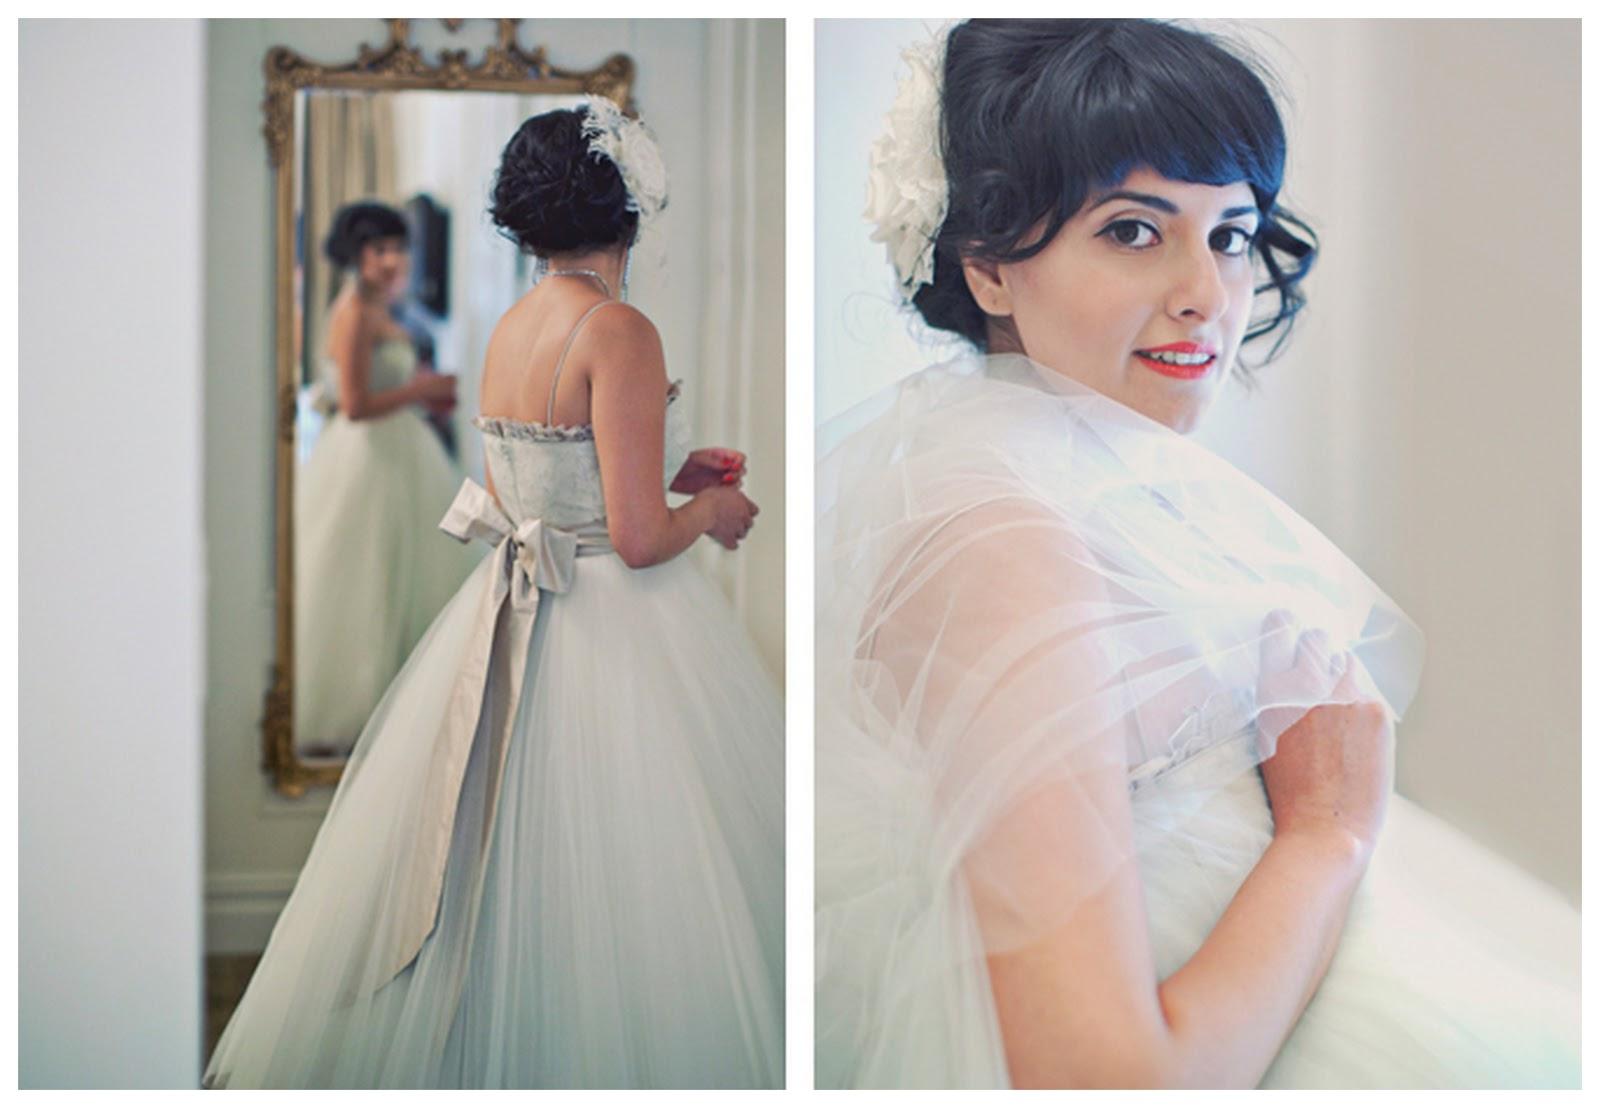 Hipster Wedding Dresses 21 Popular